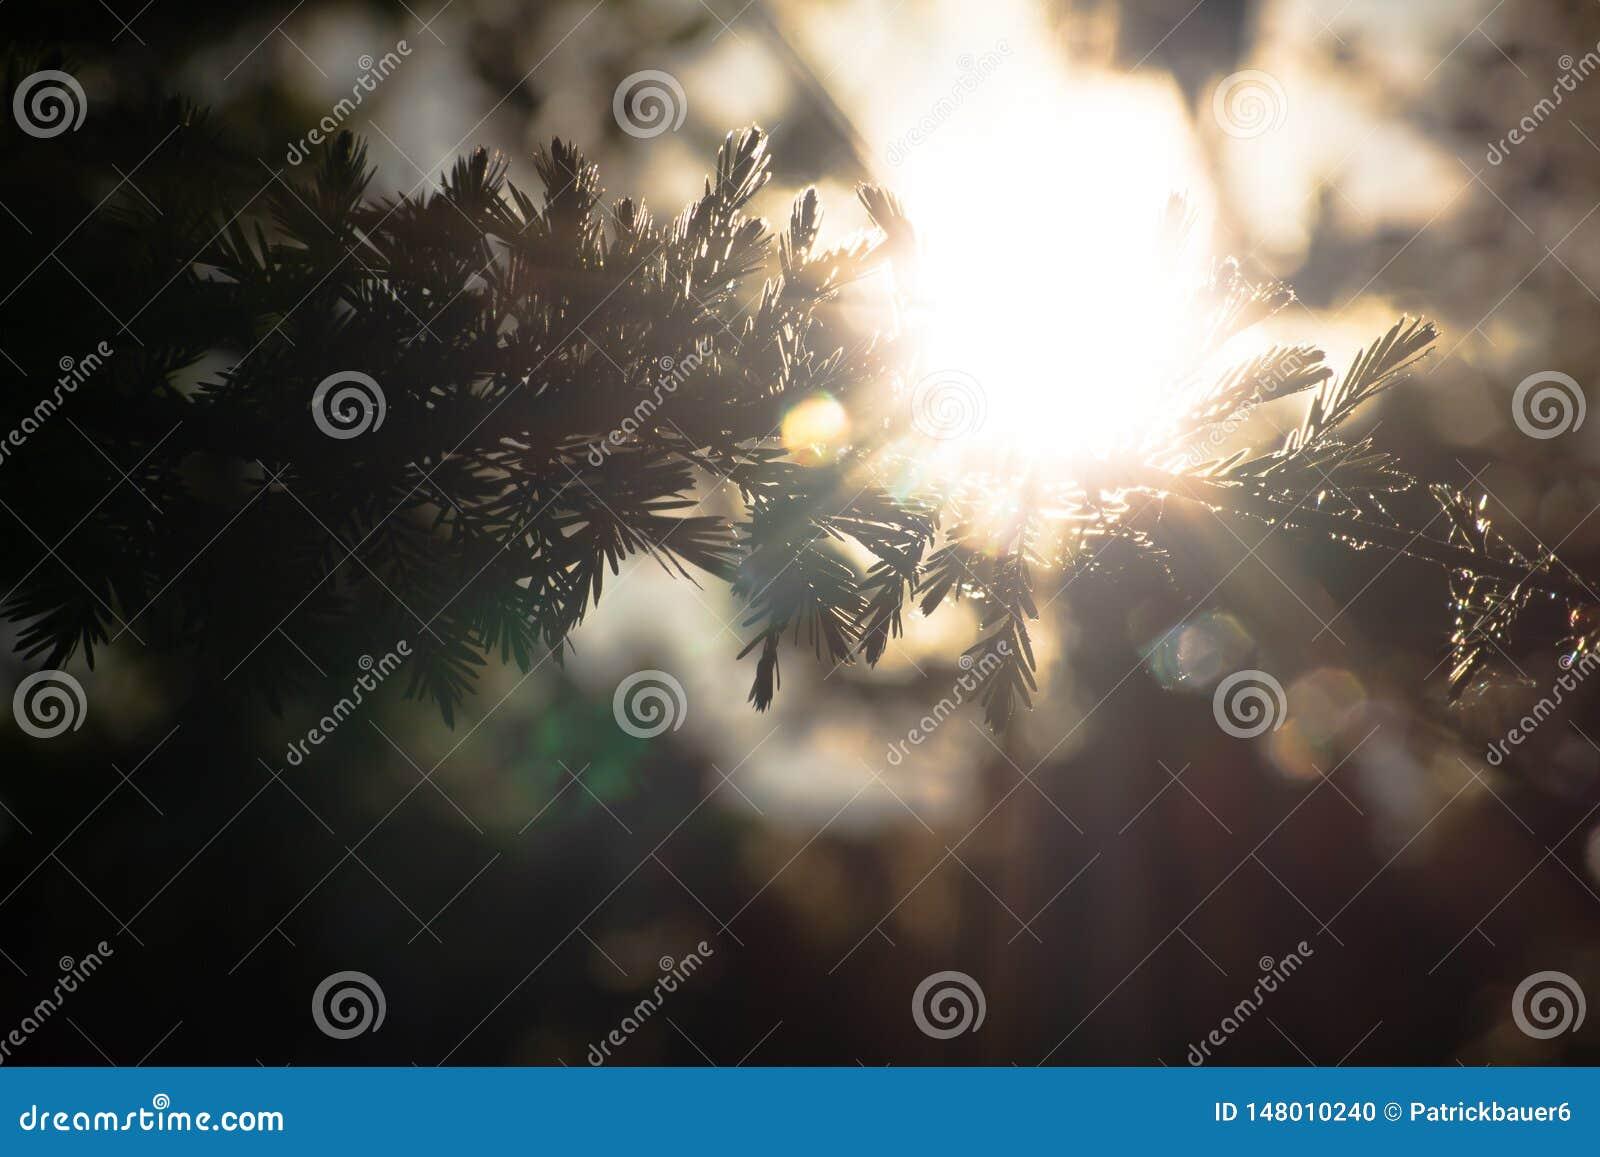 Sunlight shining through branches